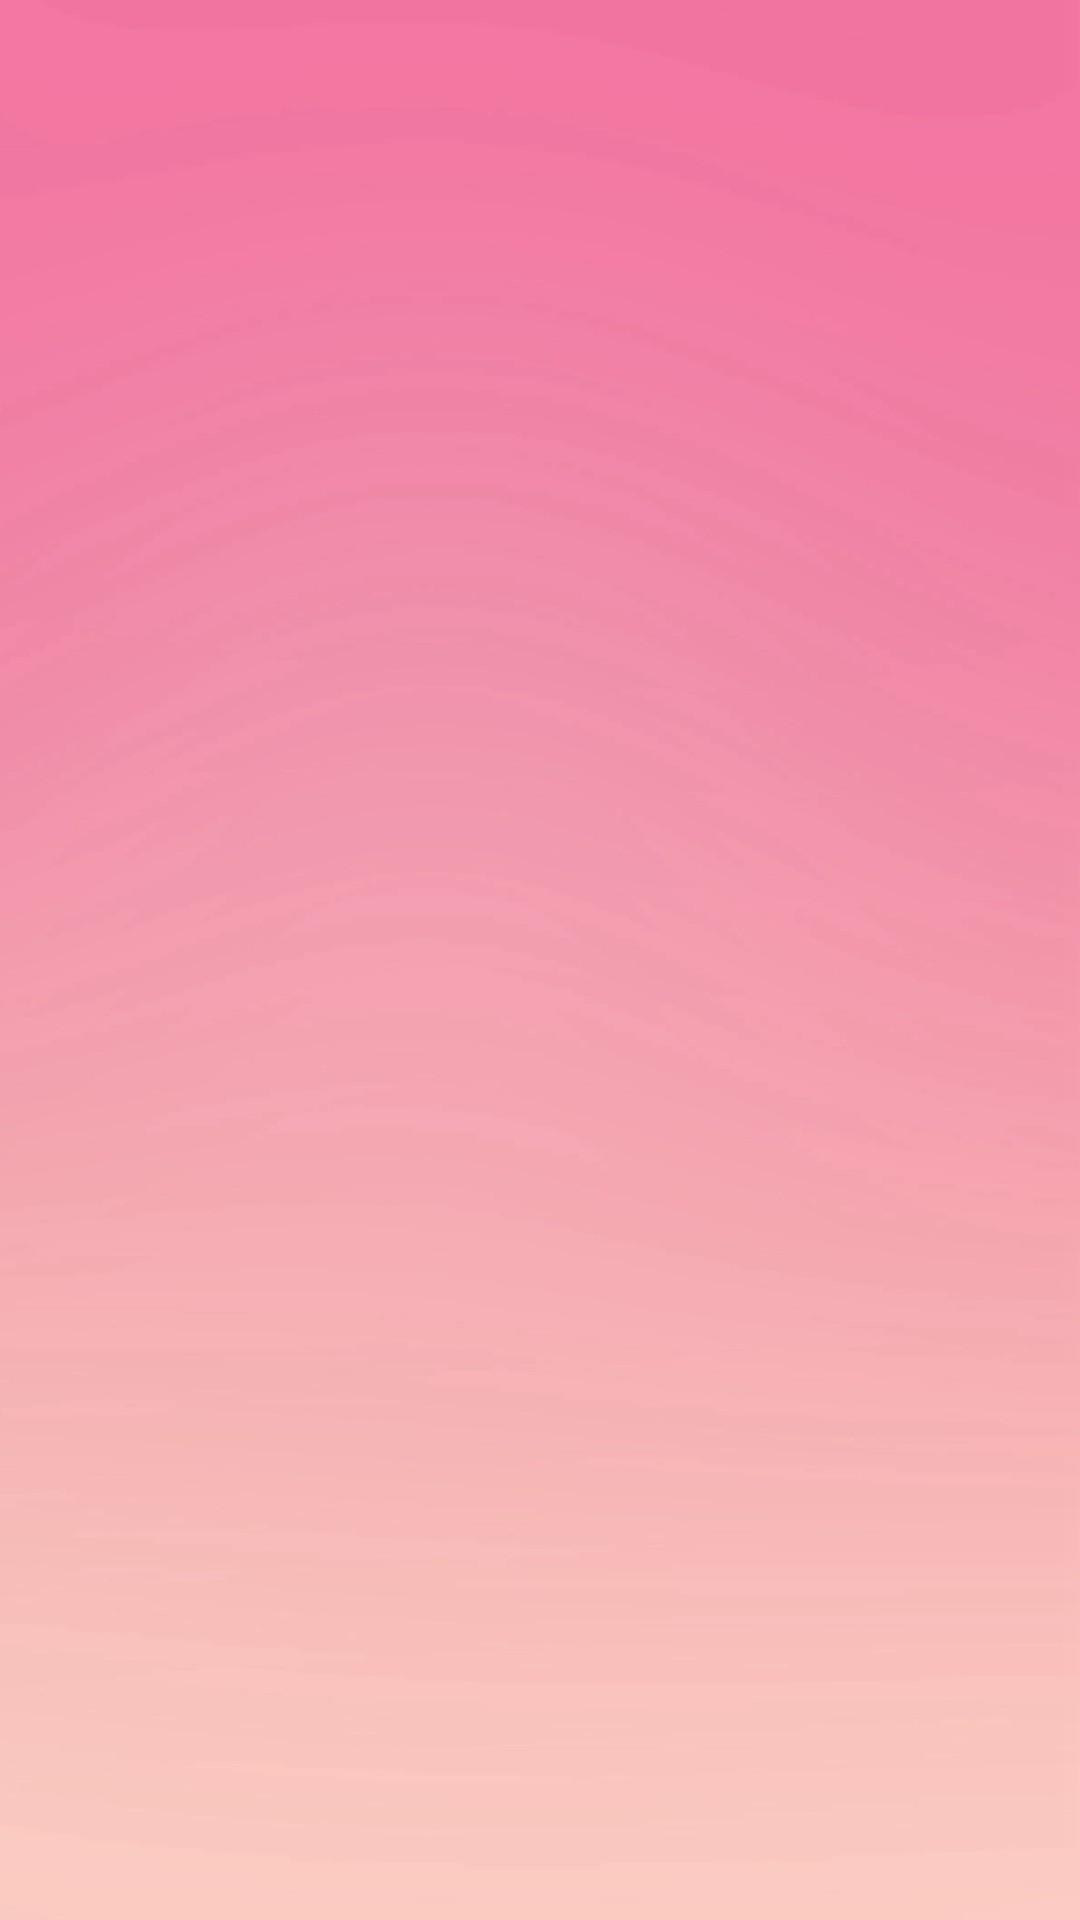 Pink Yellow Gradation Blur iPhone 6 wallpaper